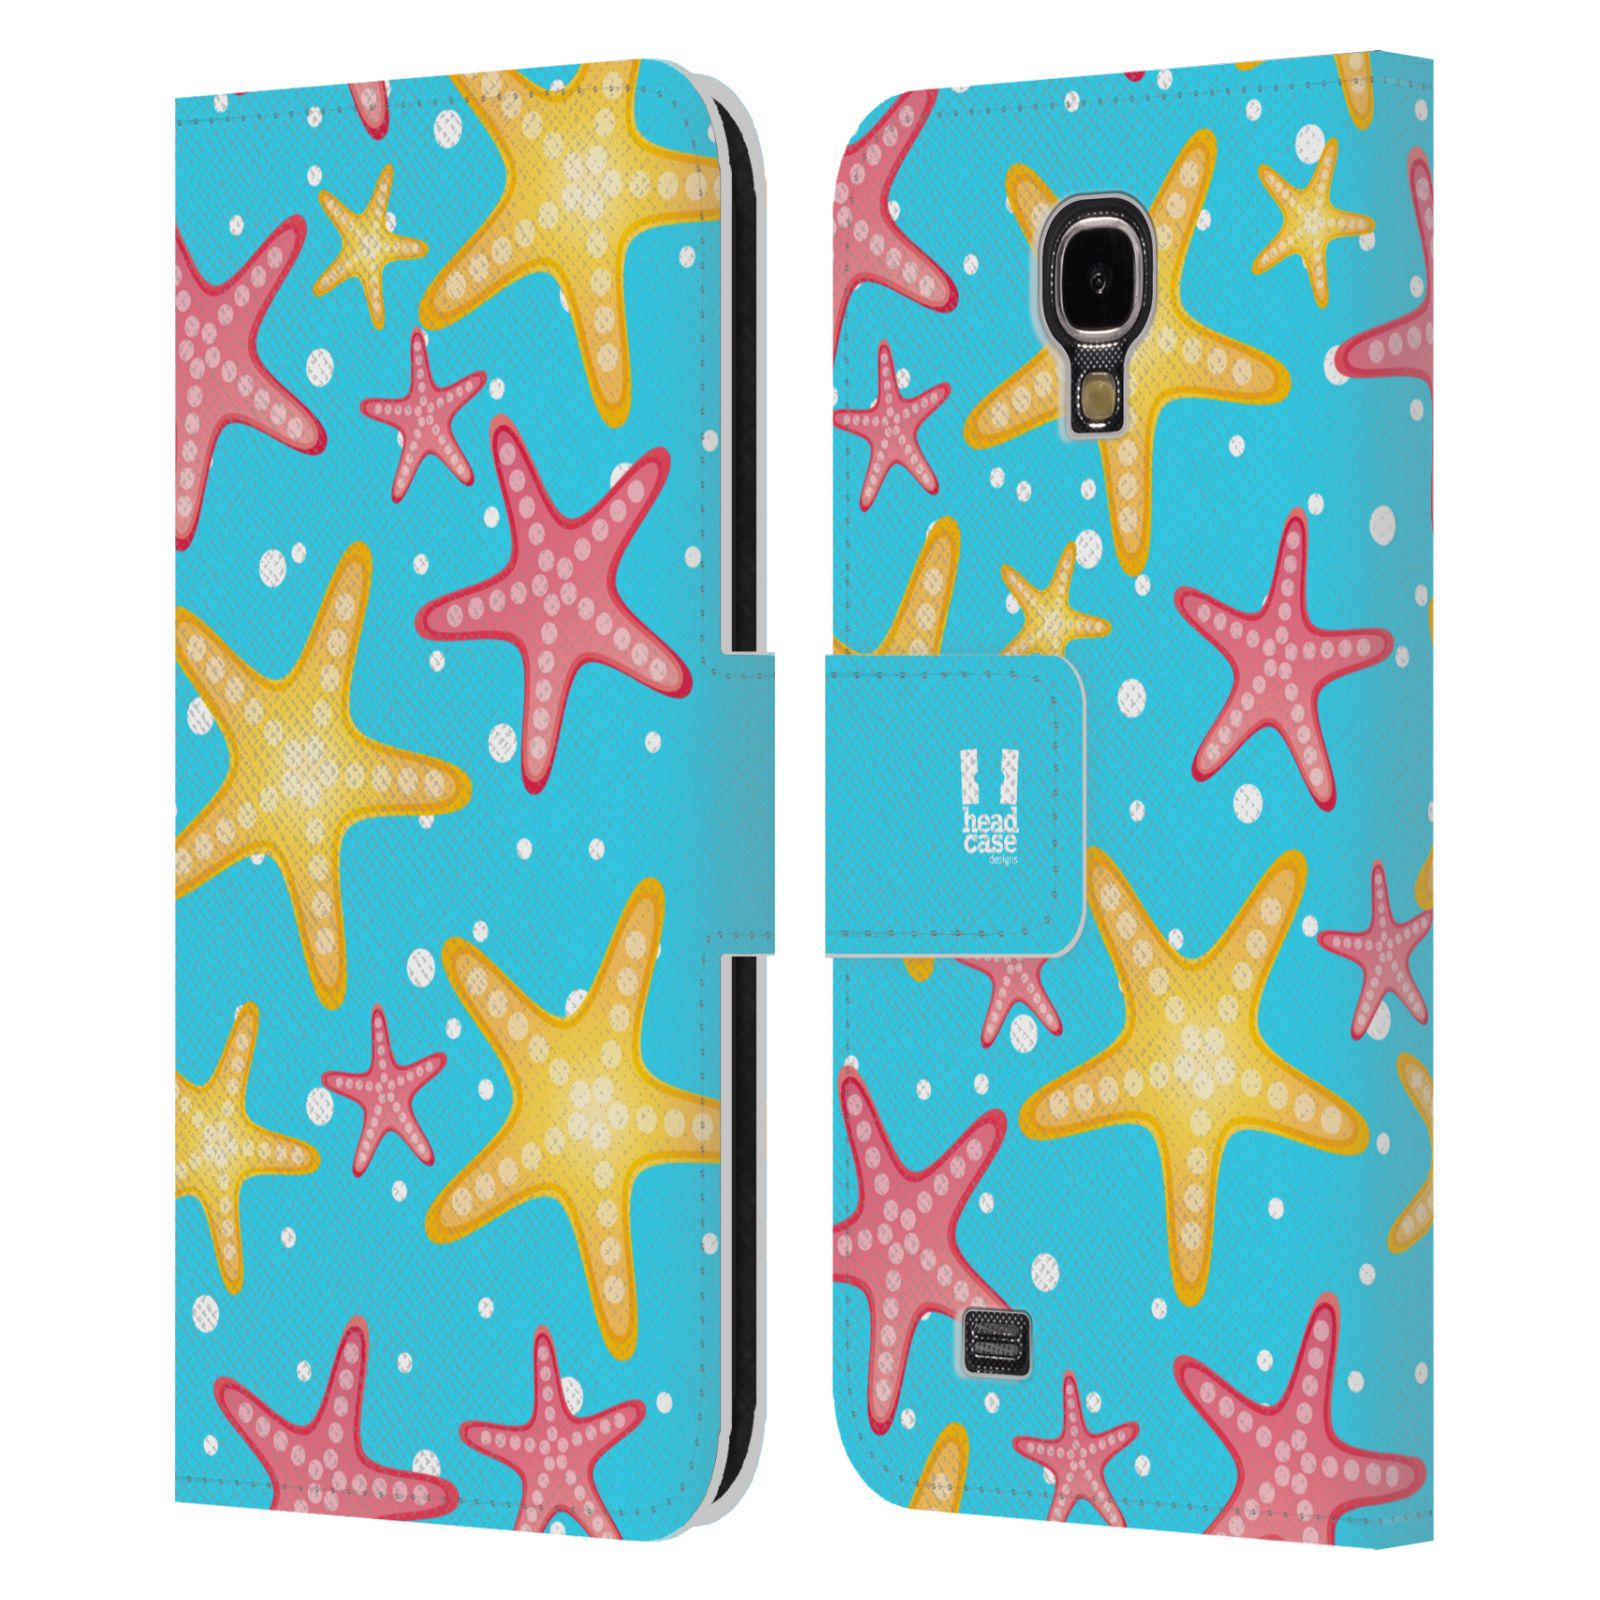 HEAD CASE Flipové pouzdro pro mobil Samsung Galaxy S4 Mořský živočich hvězdice modrá barva pozadí